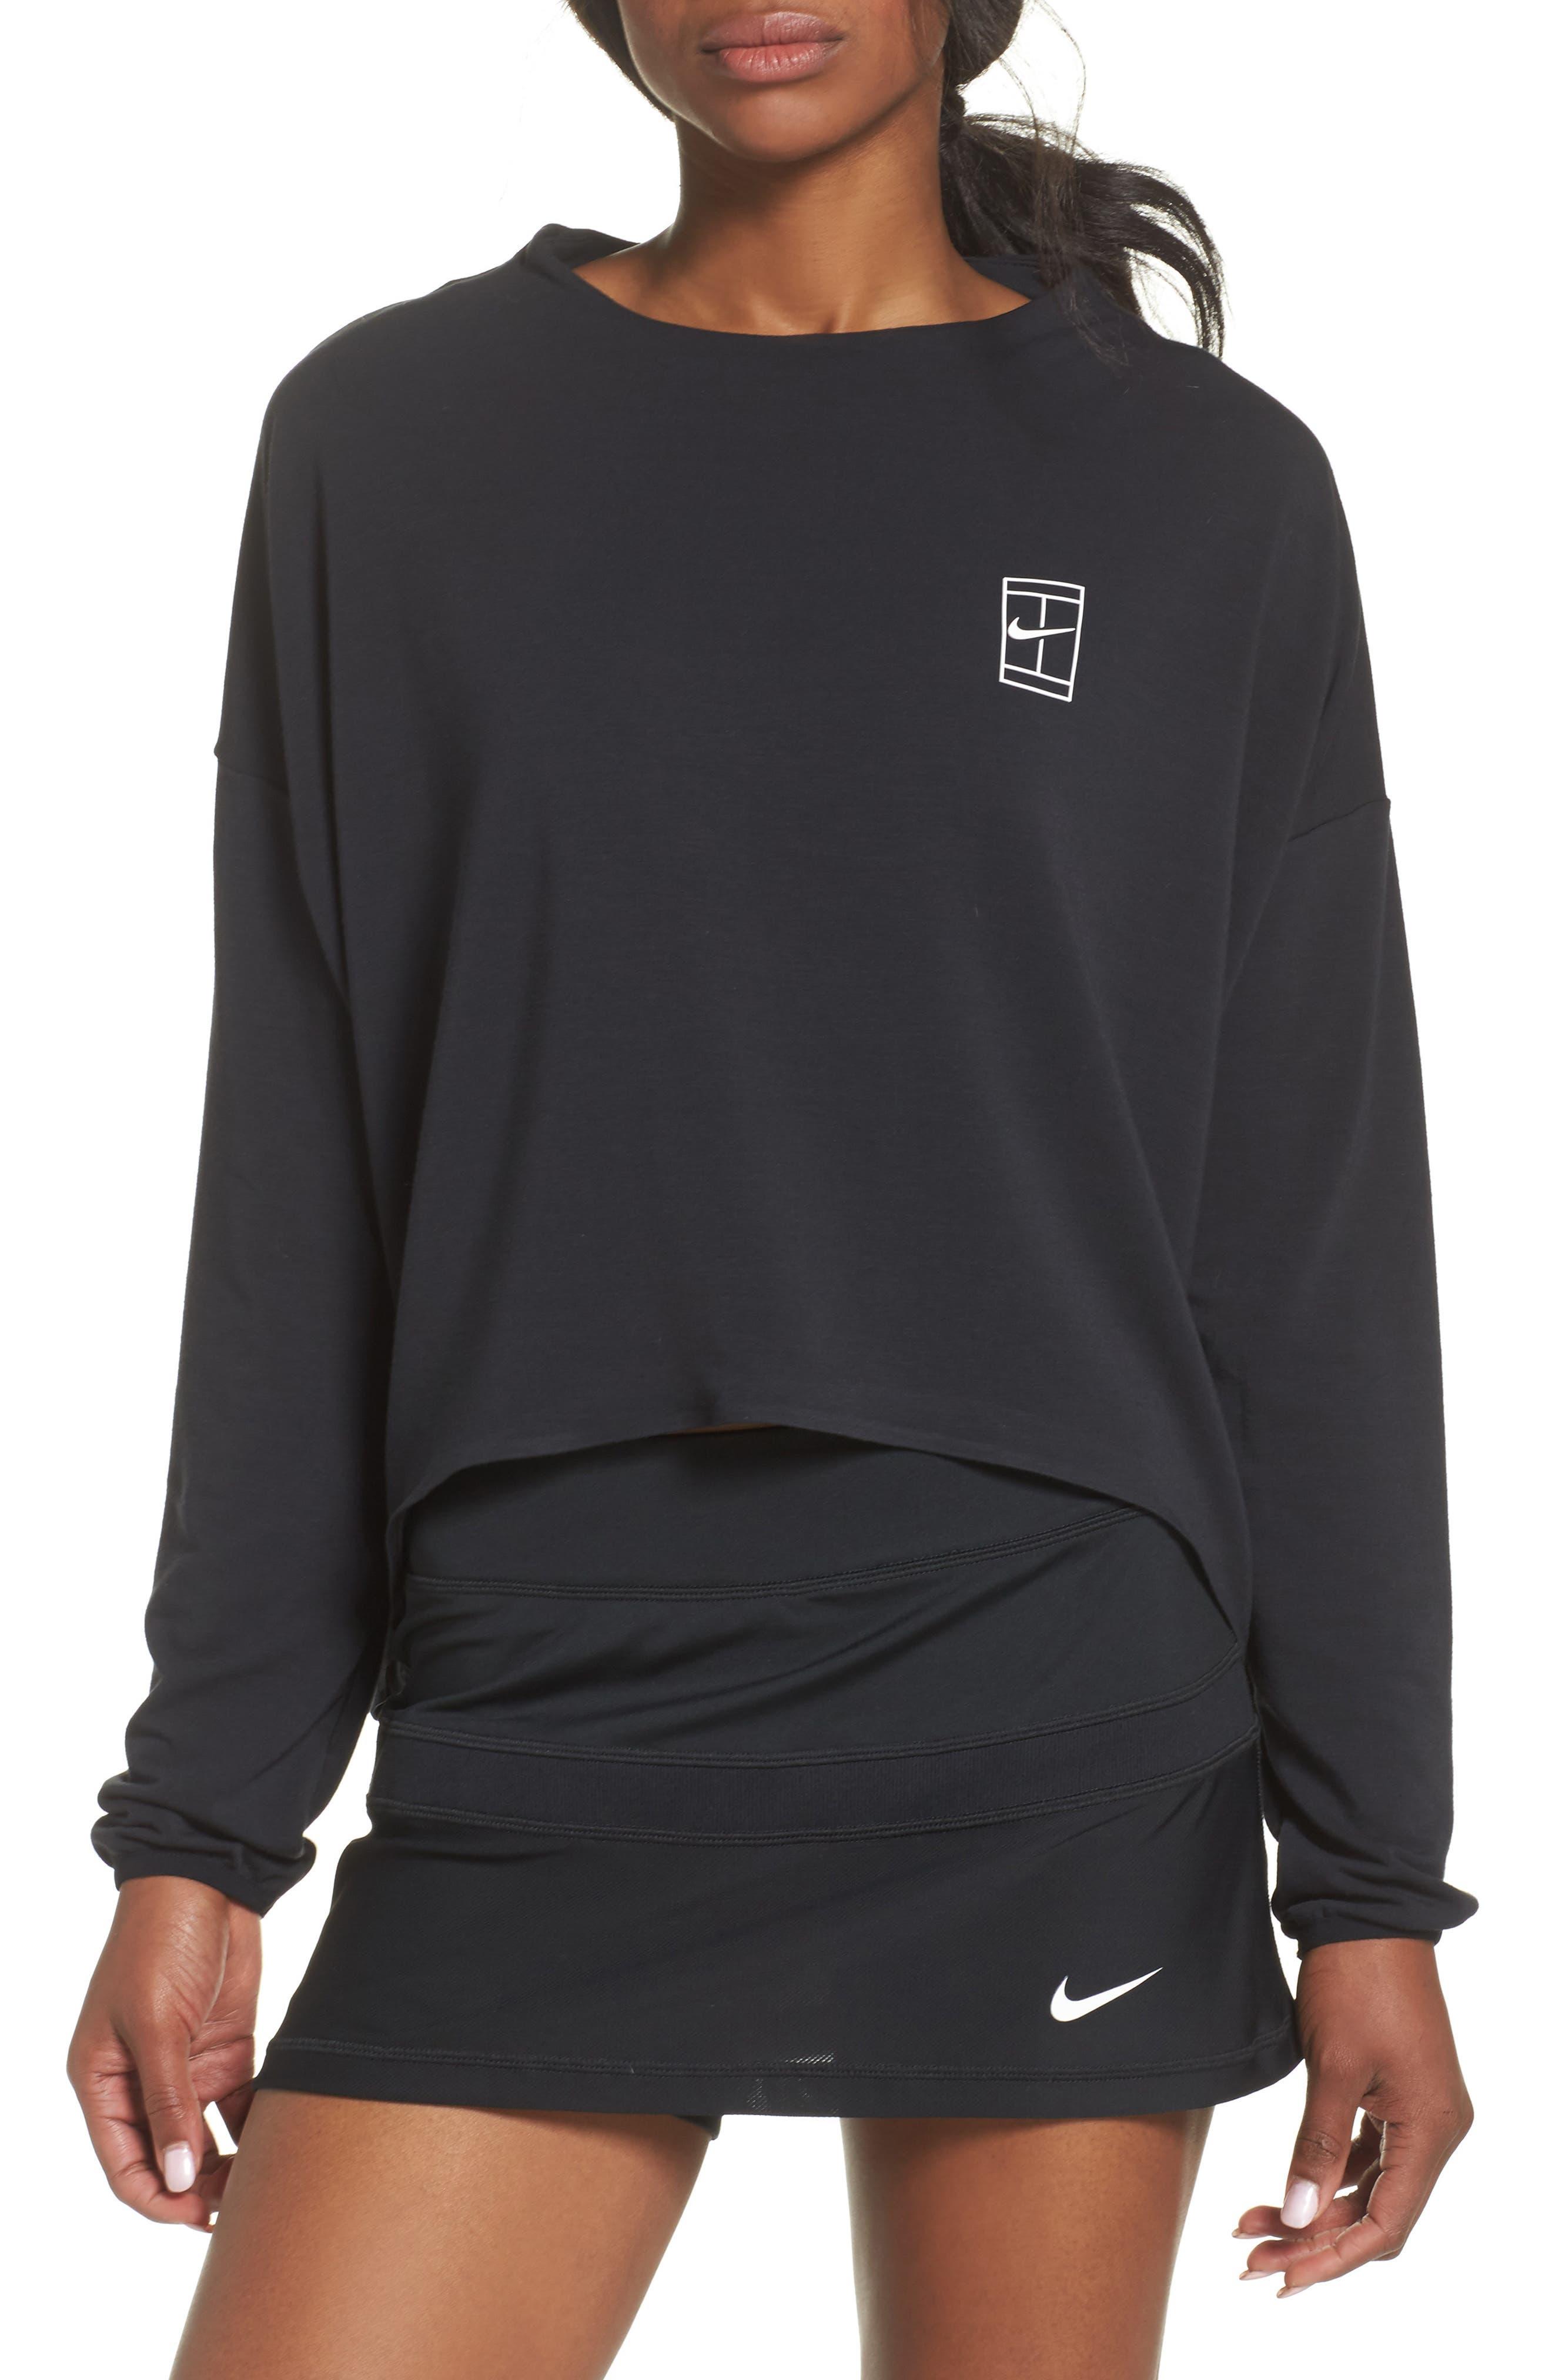 Court Dri-FIT Long Sleeve Tennis Top,                         Main,                         color, 010